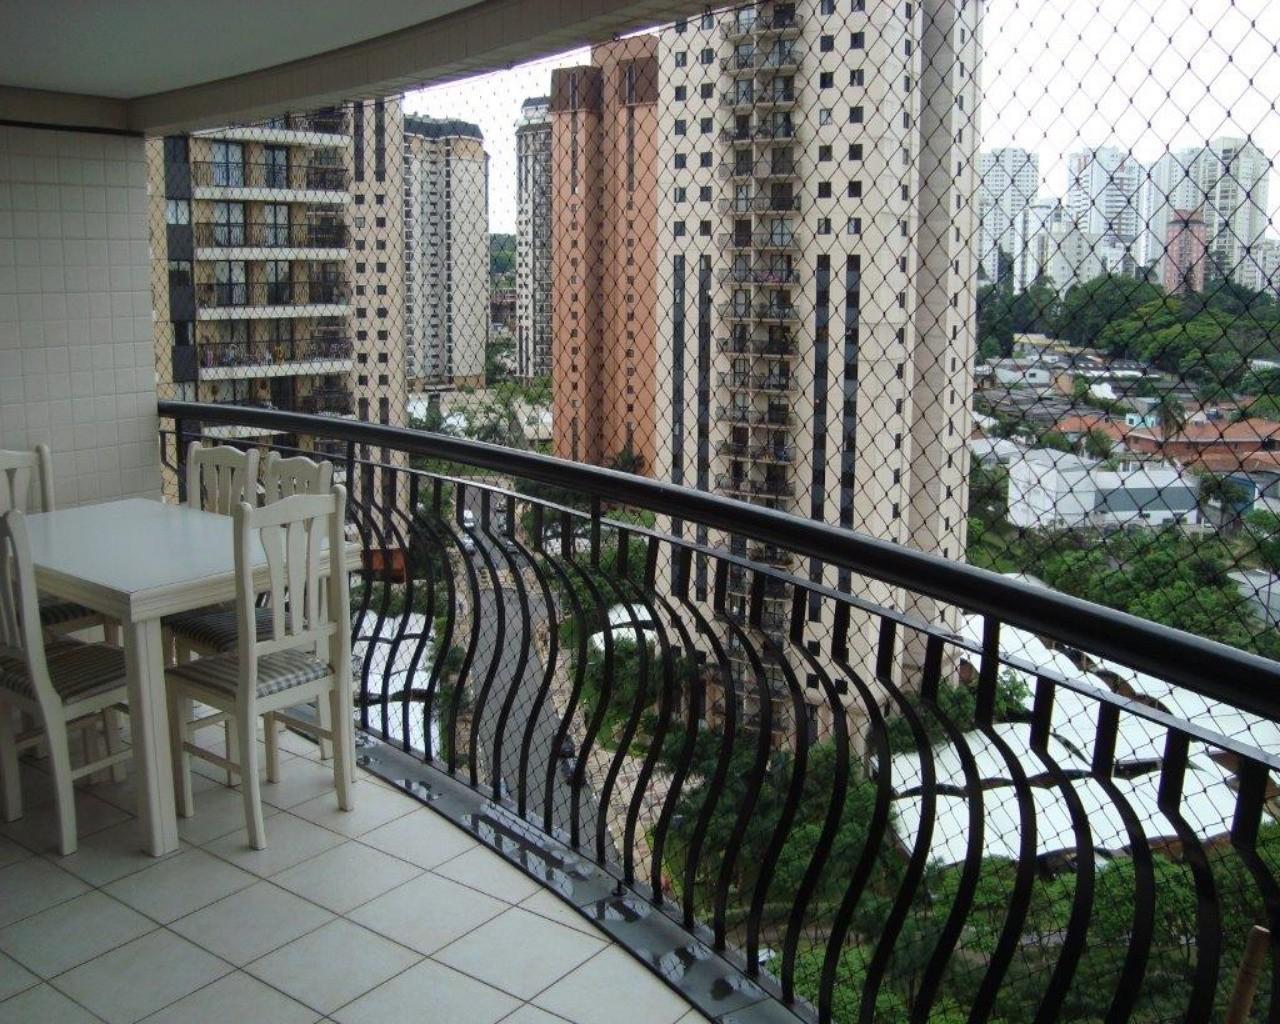 comprar ou alugar apartamento no bairro alto  da boa vista na cidade de sao paulo-sp